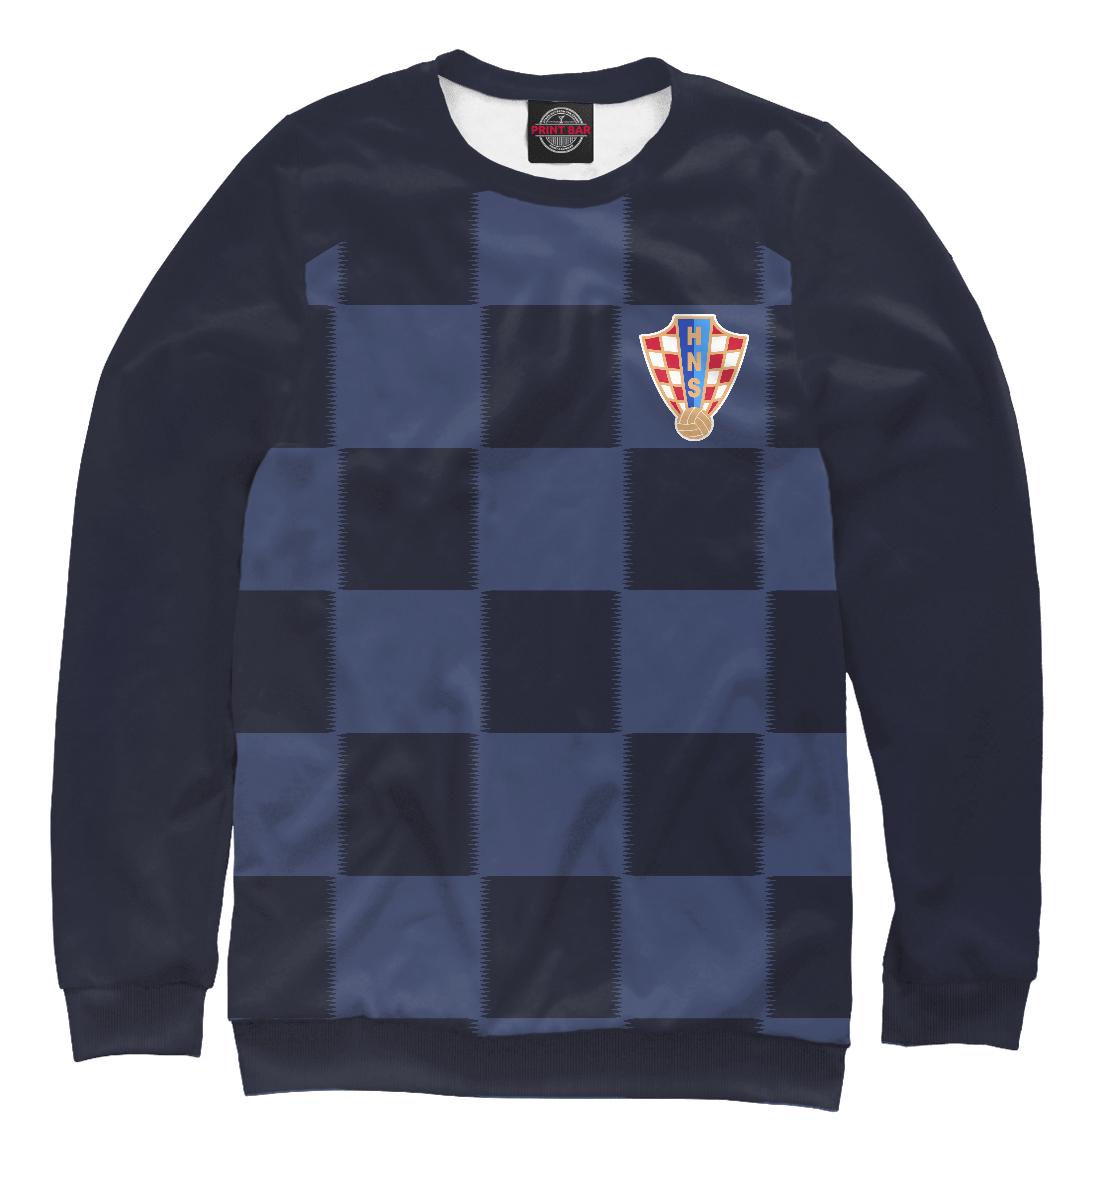 Купить Хорватия, Printbar, Свитшоты, FNS-806678-swi-2